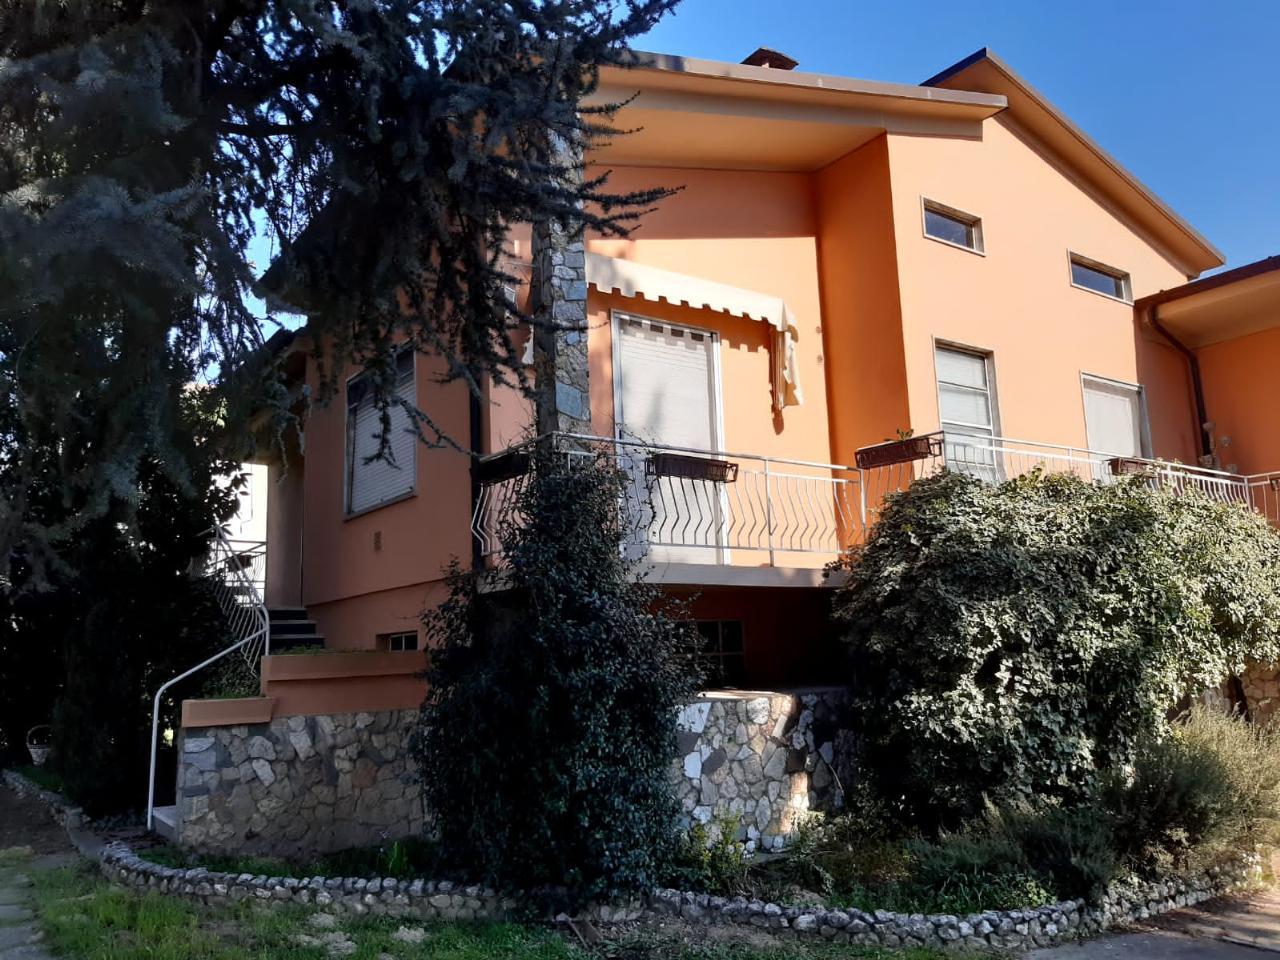 Villa indipendente TORRE DE' PICENARDI Euro 139.000,00